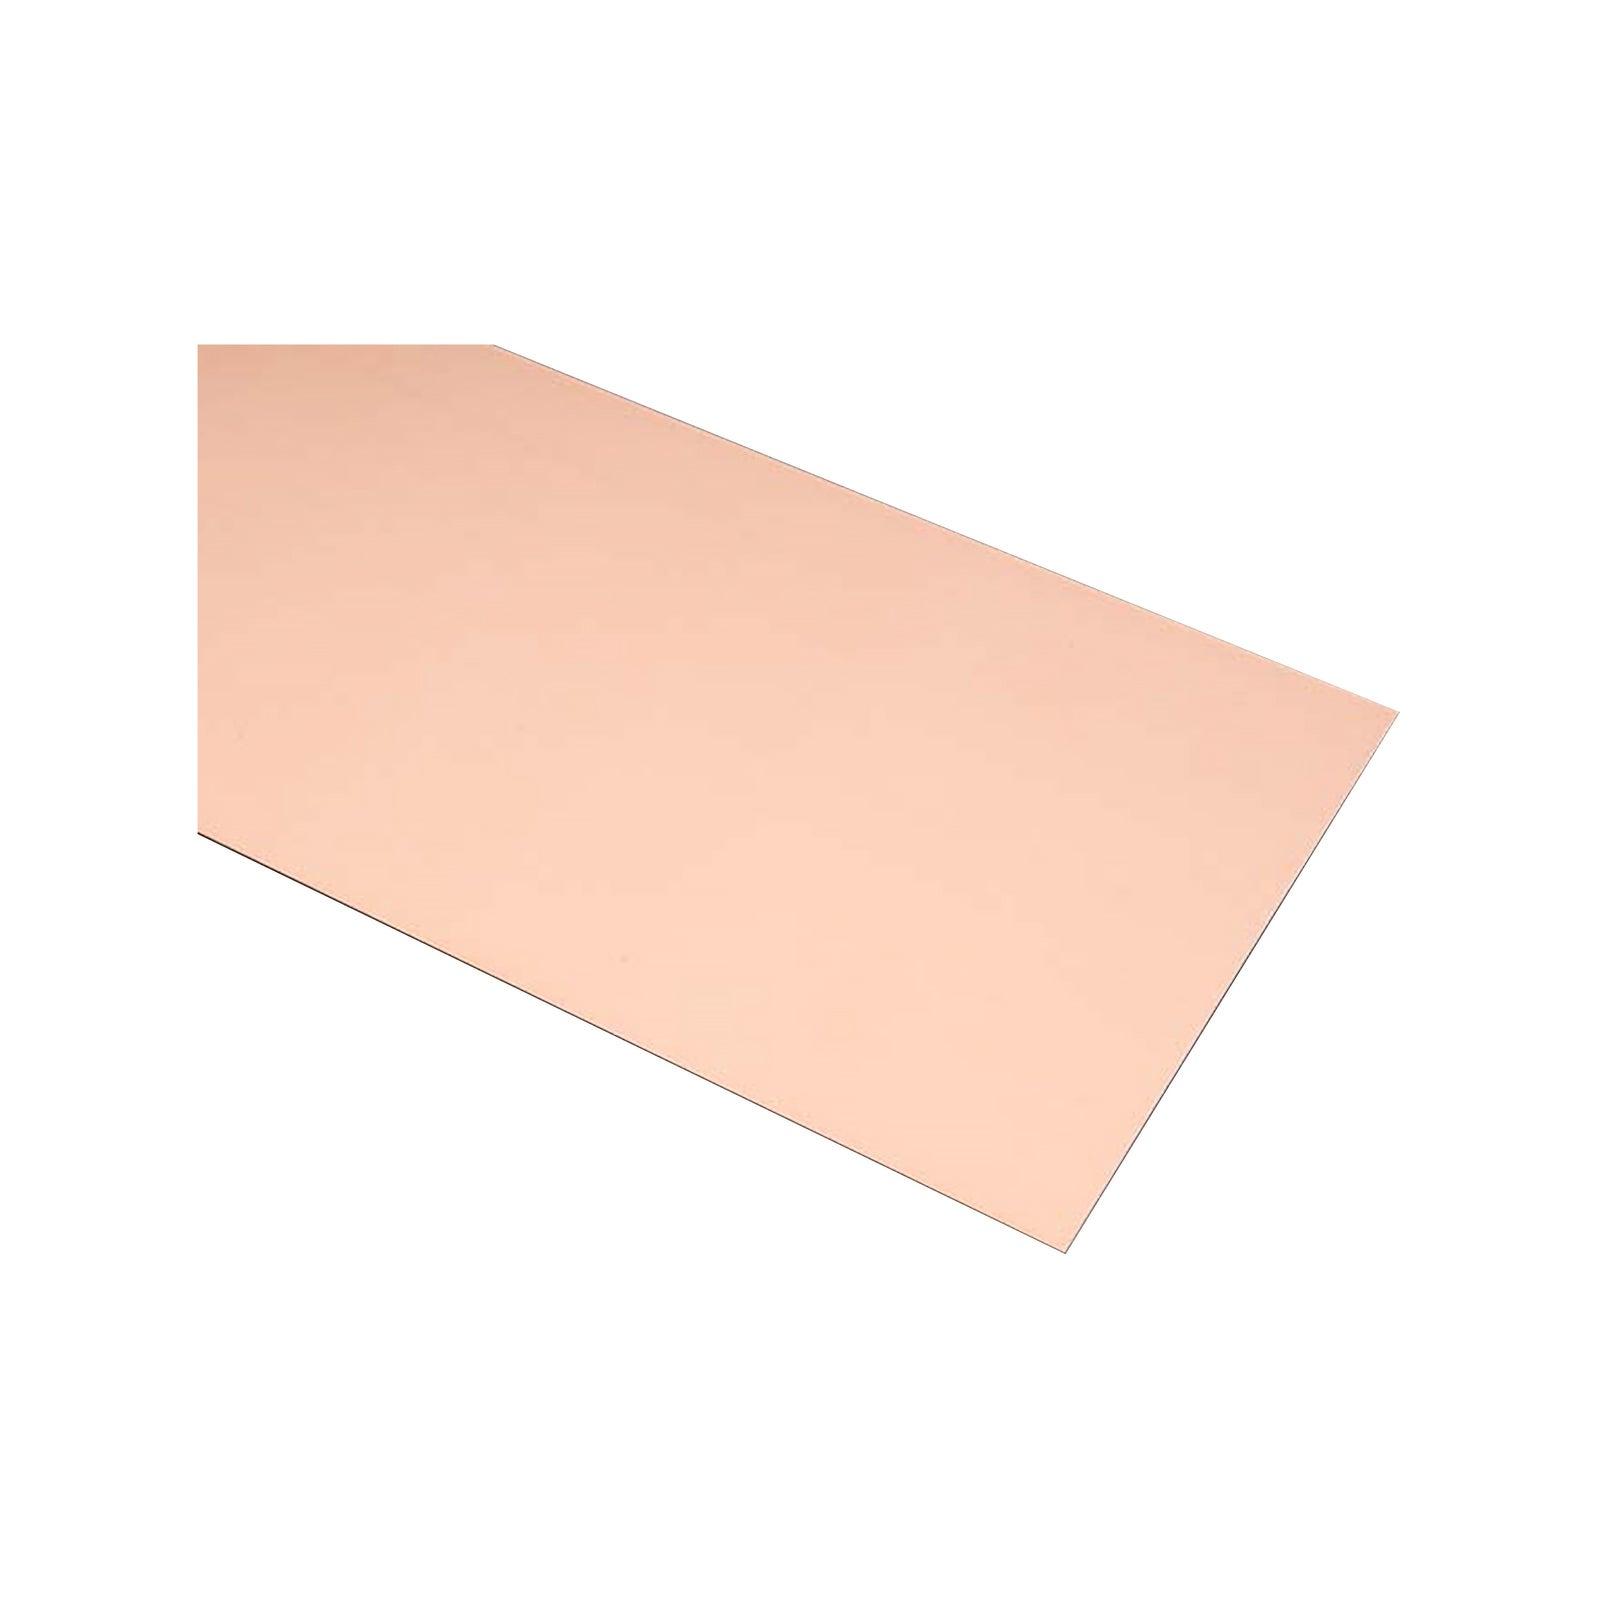 Copper Sheet Metal .016x4x10 (RM)